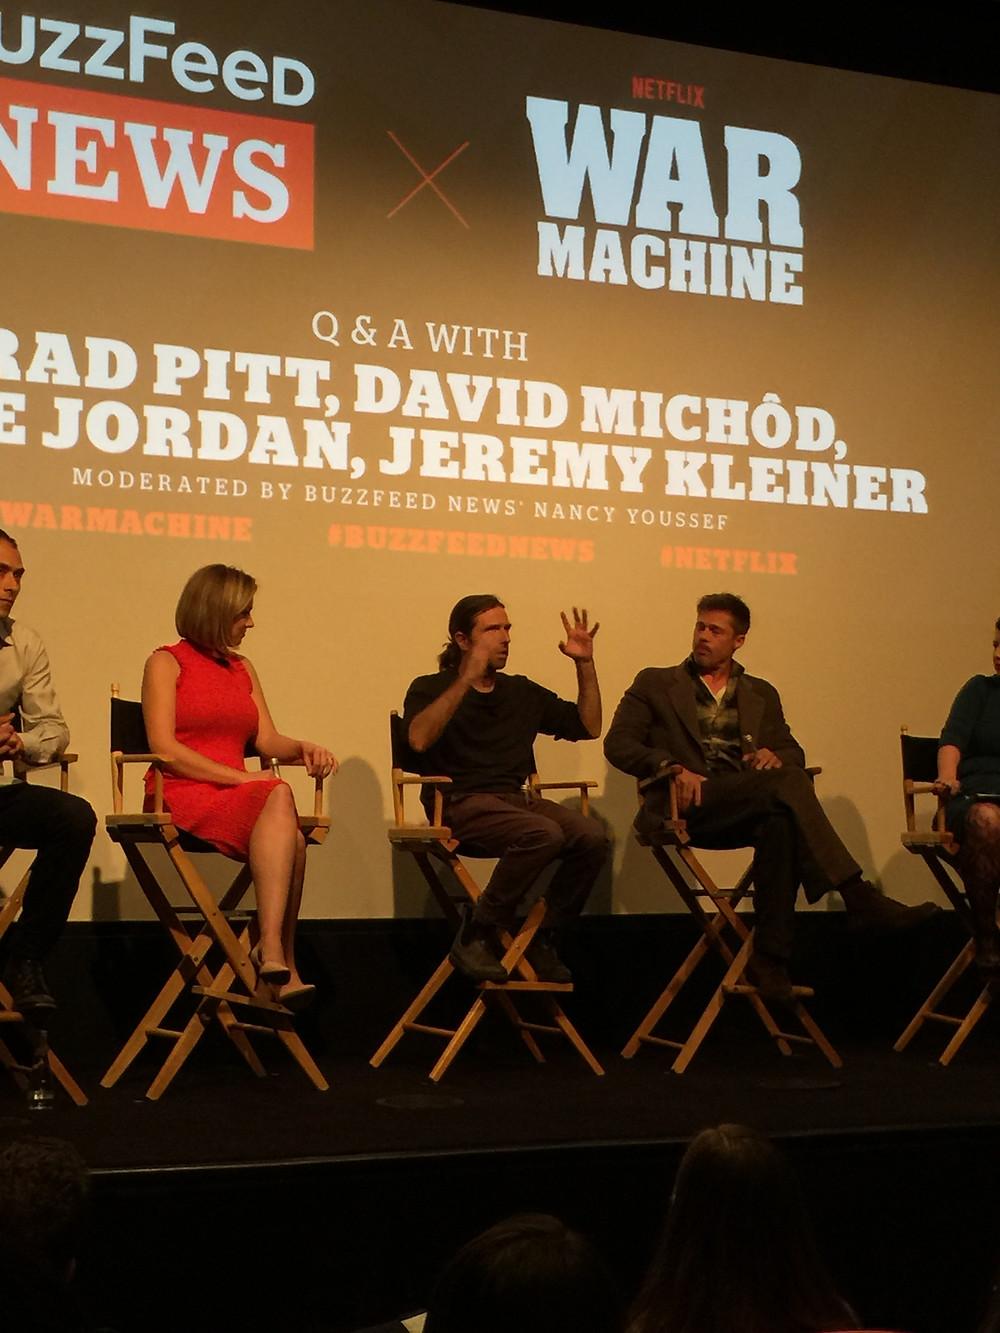 David Michod, Brad Pitt War Machine, Elise Jordan Buzzfeed premiere Q&A Michael Hastings